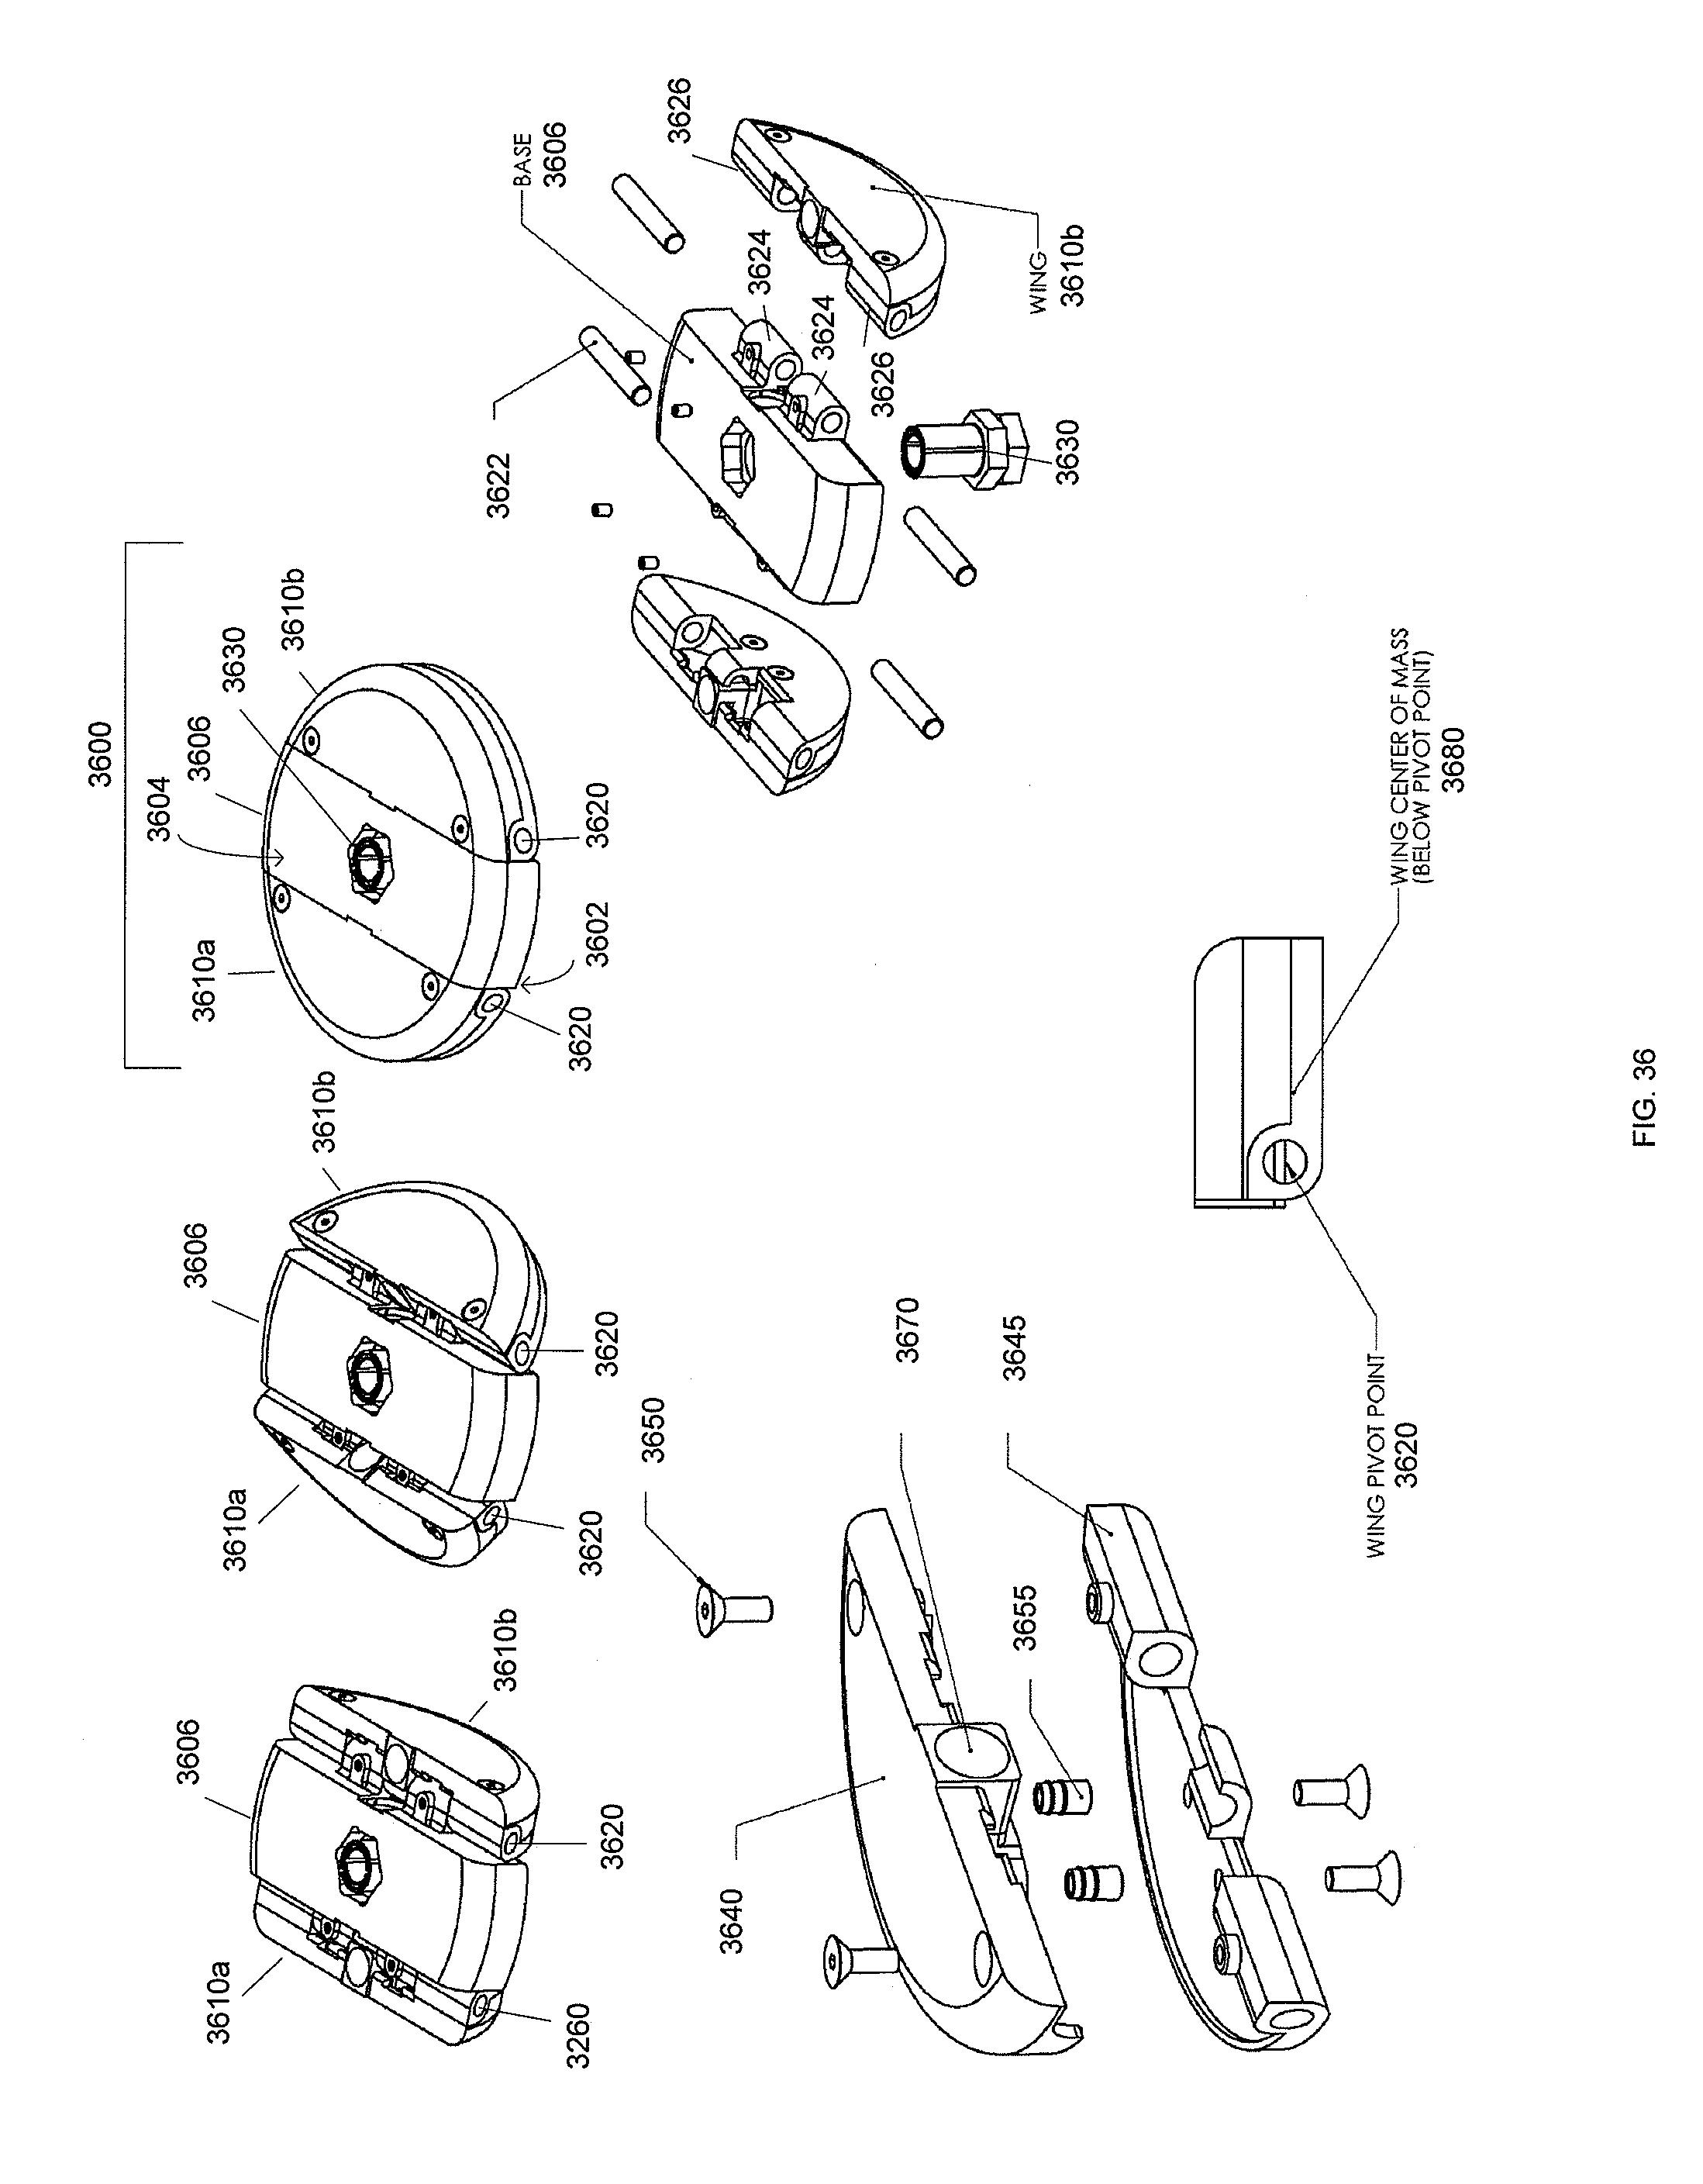 Starter Slave Solenoid Furthermore Mercruiser 3 0 Starter Wiring